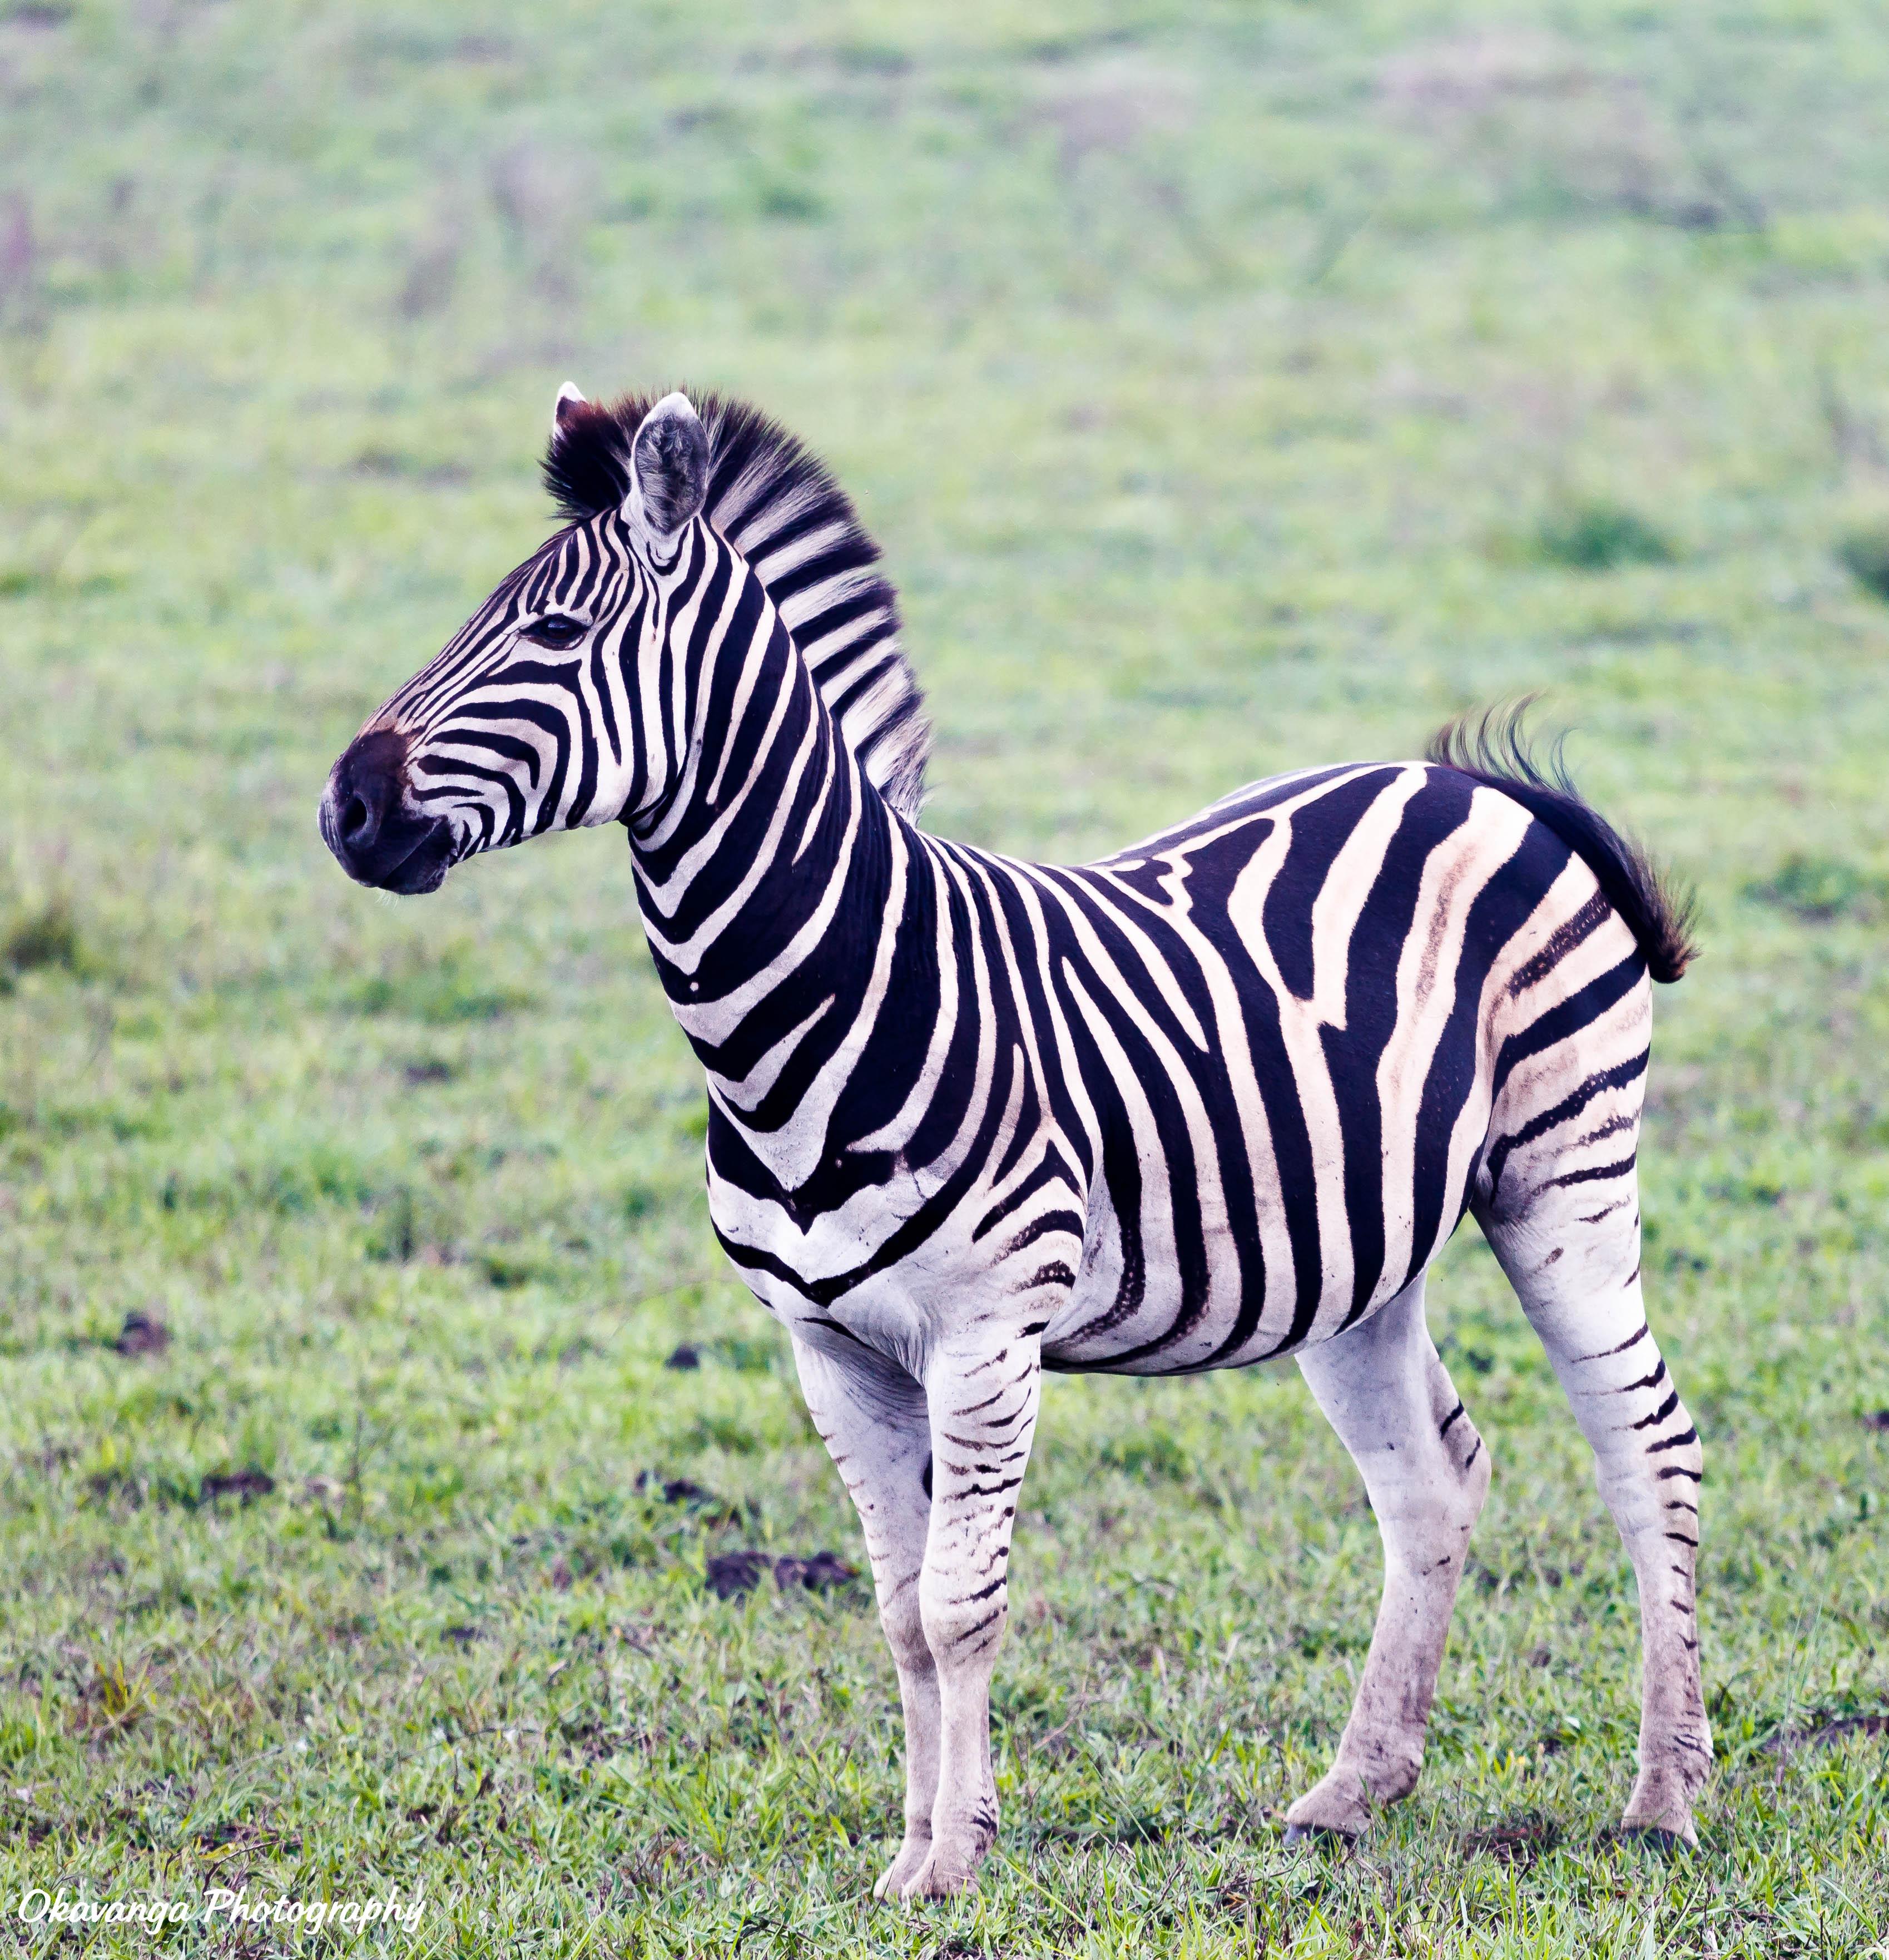 Young Zebra by Okavanga on DeviantArt